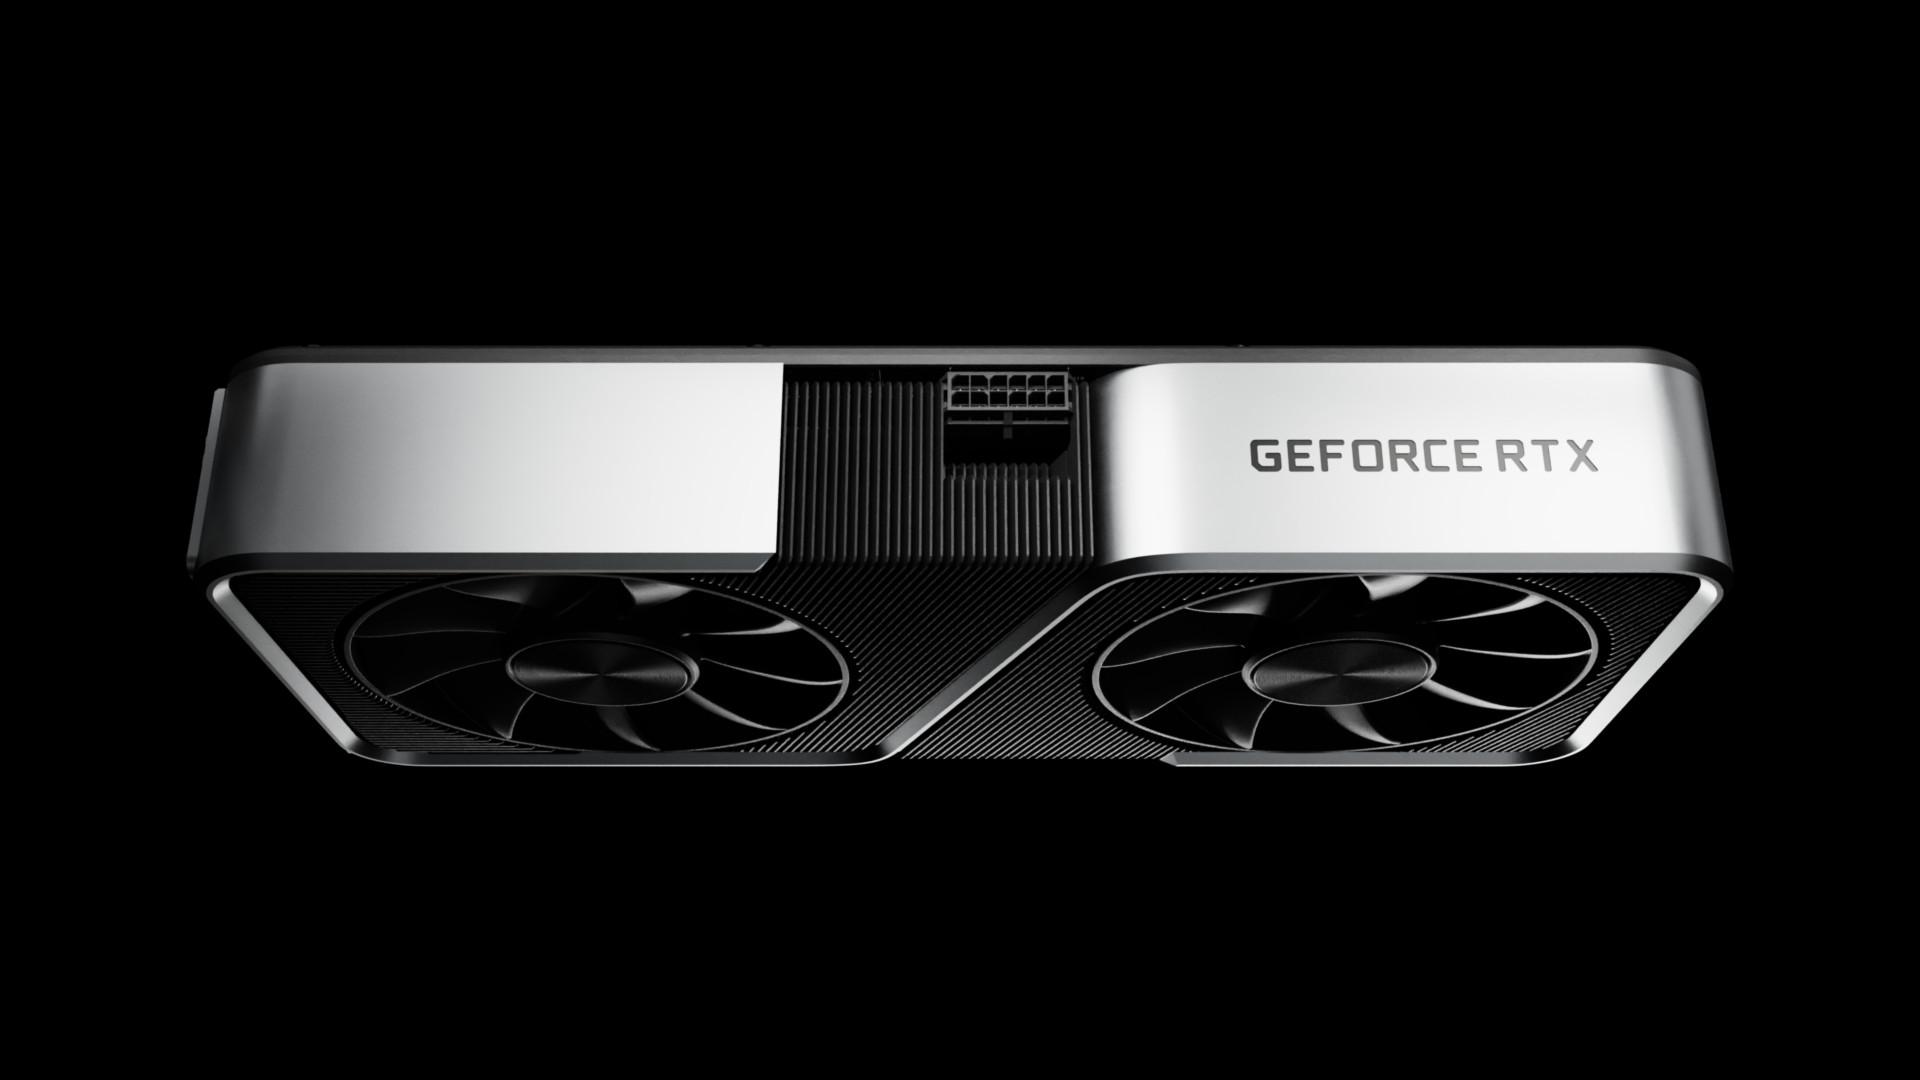 Nvidia Geforce Rtx 3060 Ti graphics card